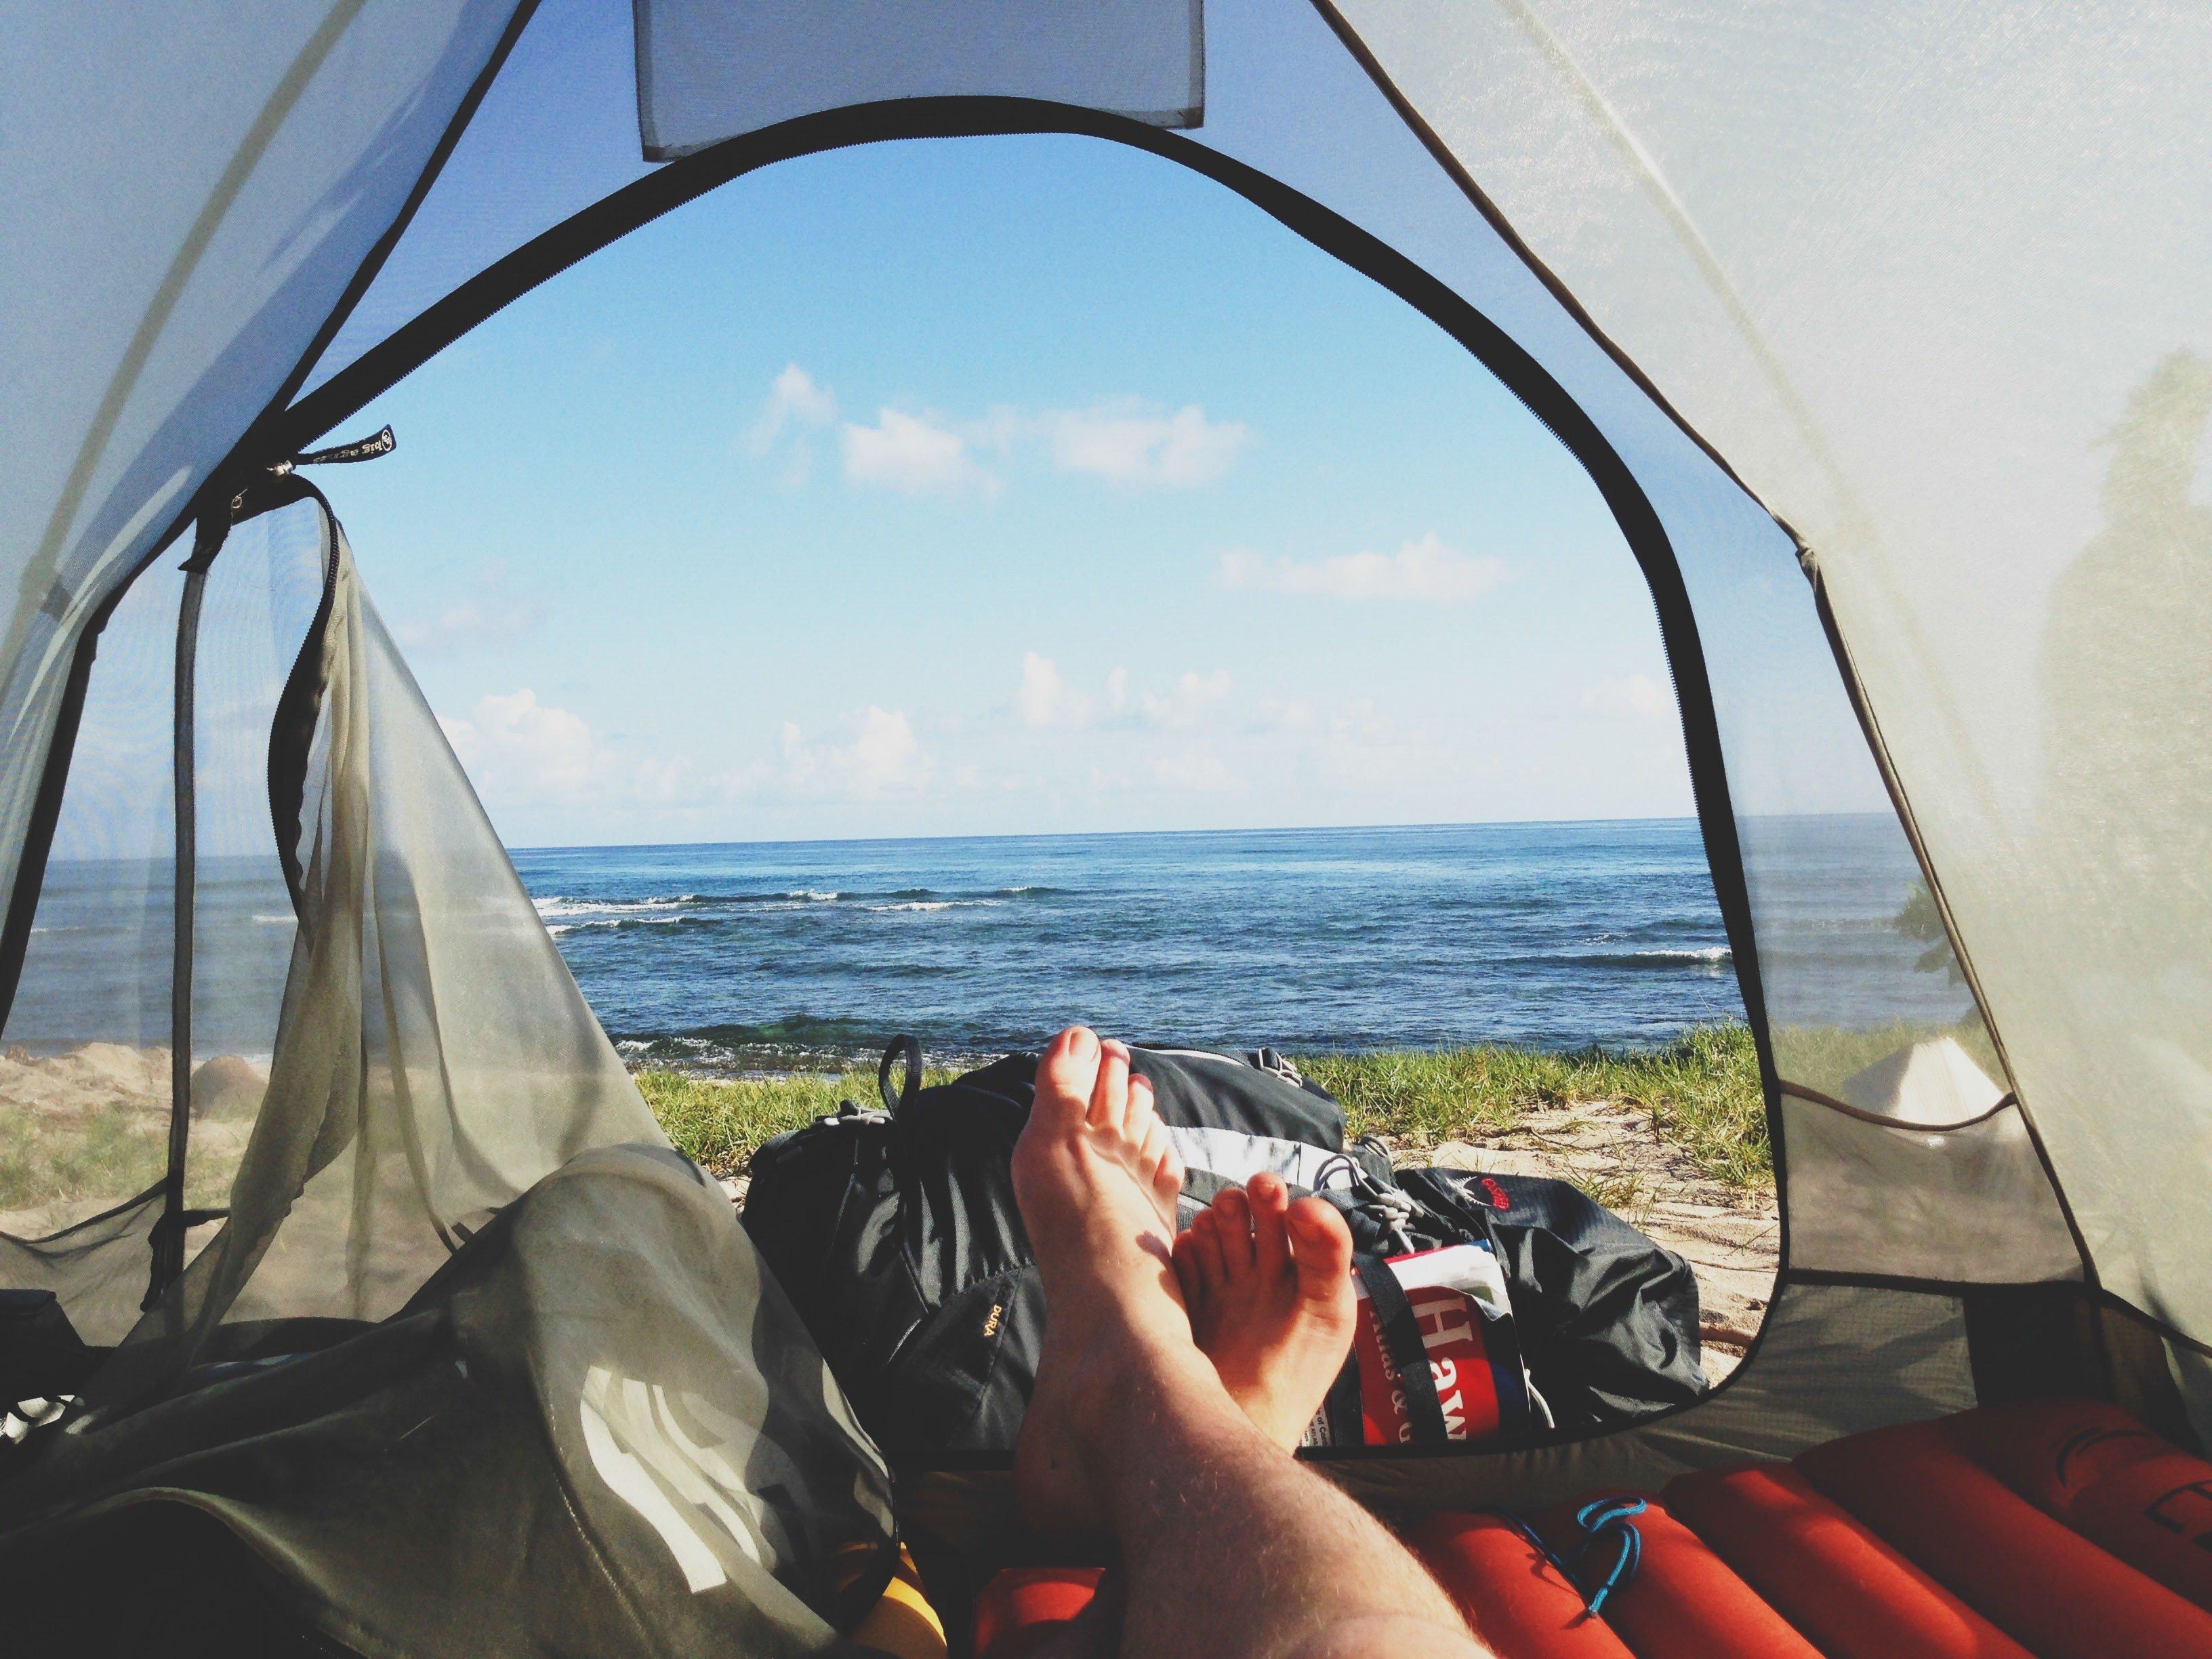 Guy's Feet inside a tent